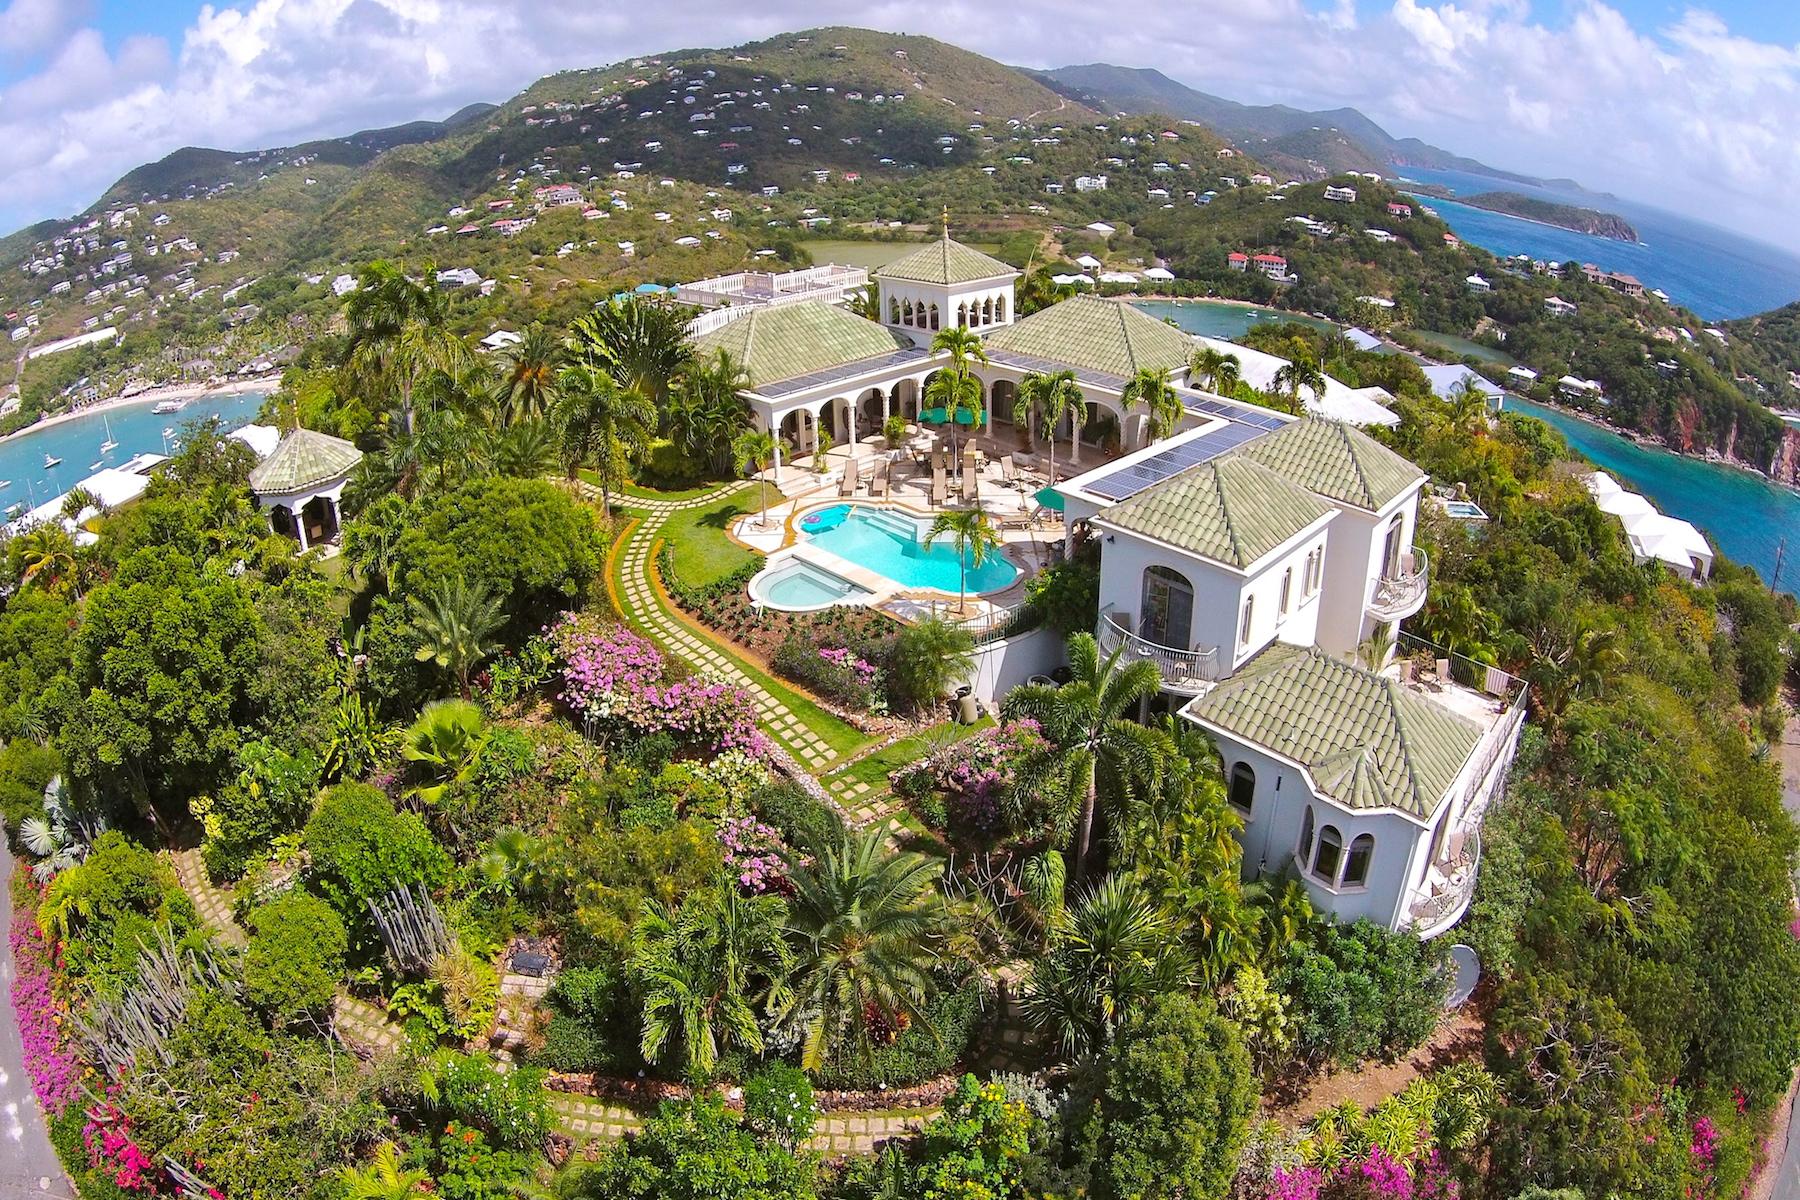 Single Family Home for Sale at Villa Kismet 80 Chocolate Hole St John, 00830 United States Virgin Islands